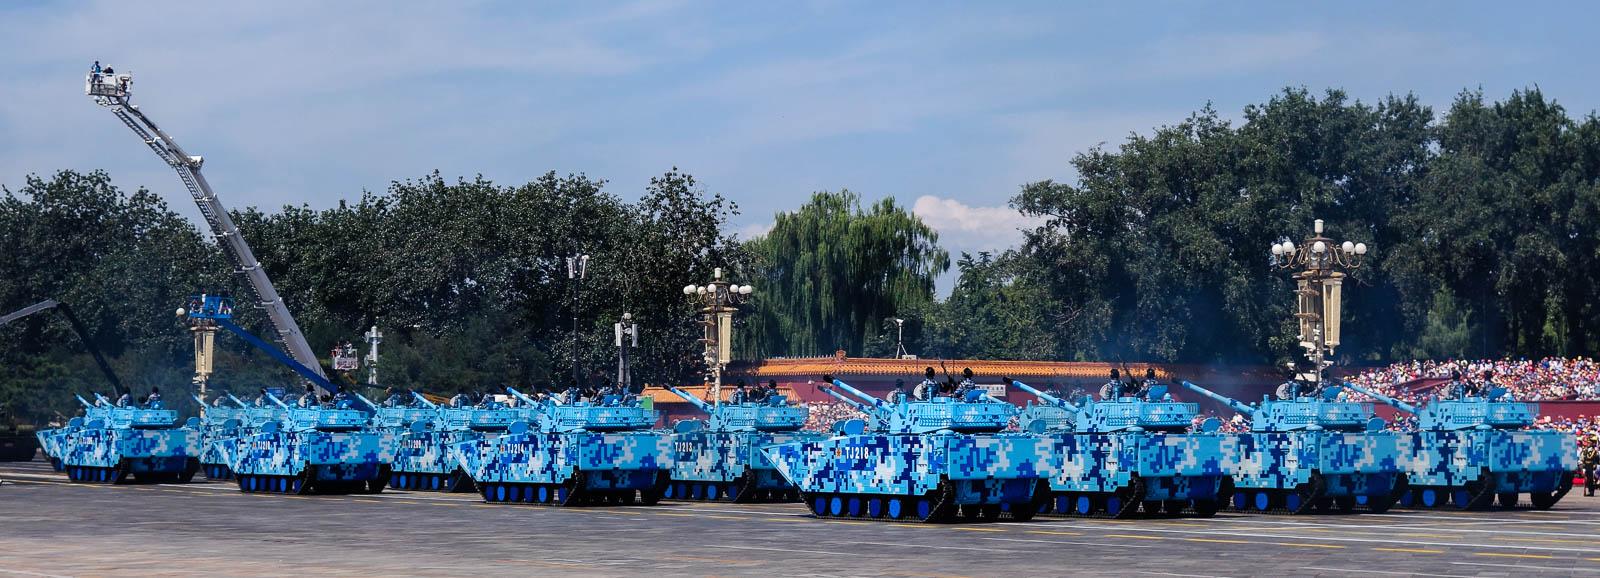 beijing-china-military-parade-2015-30